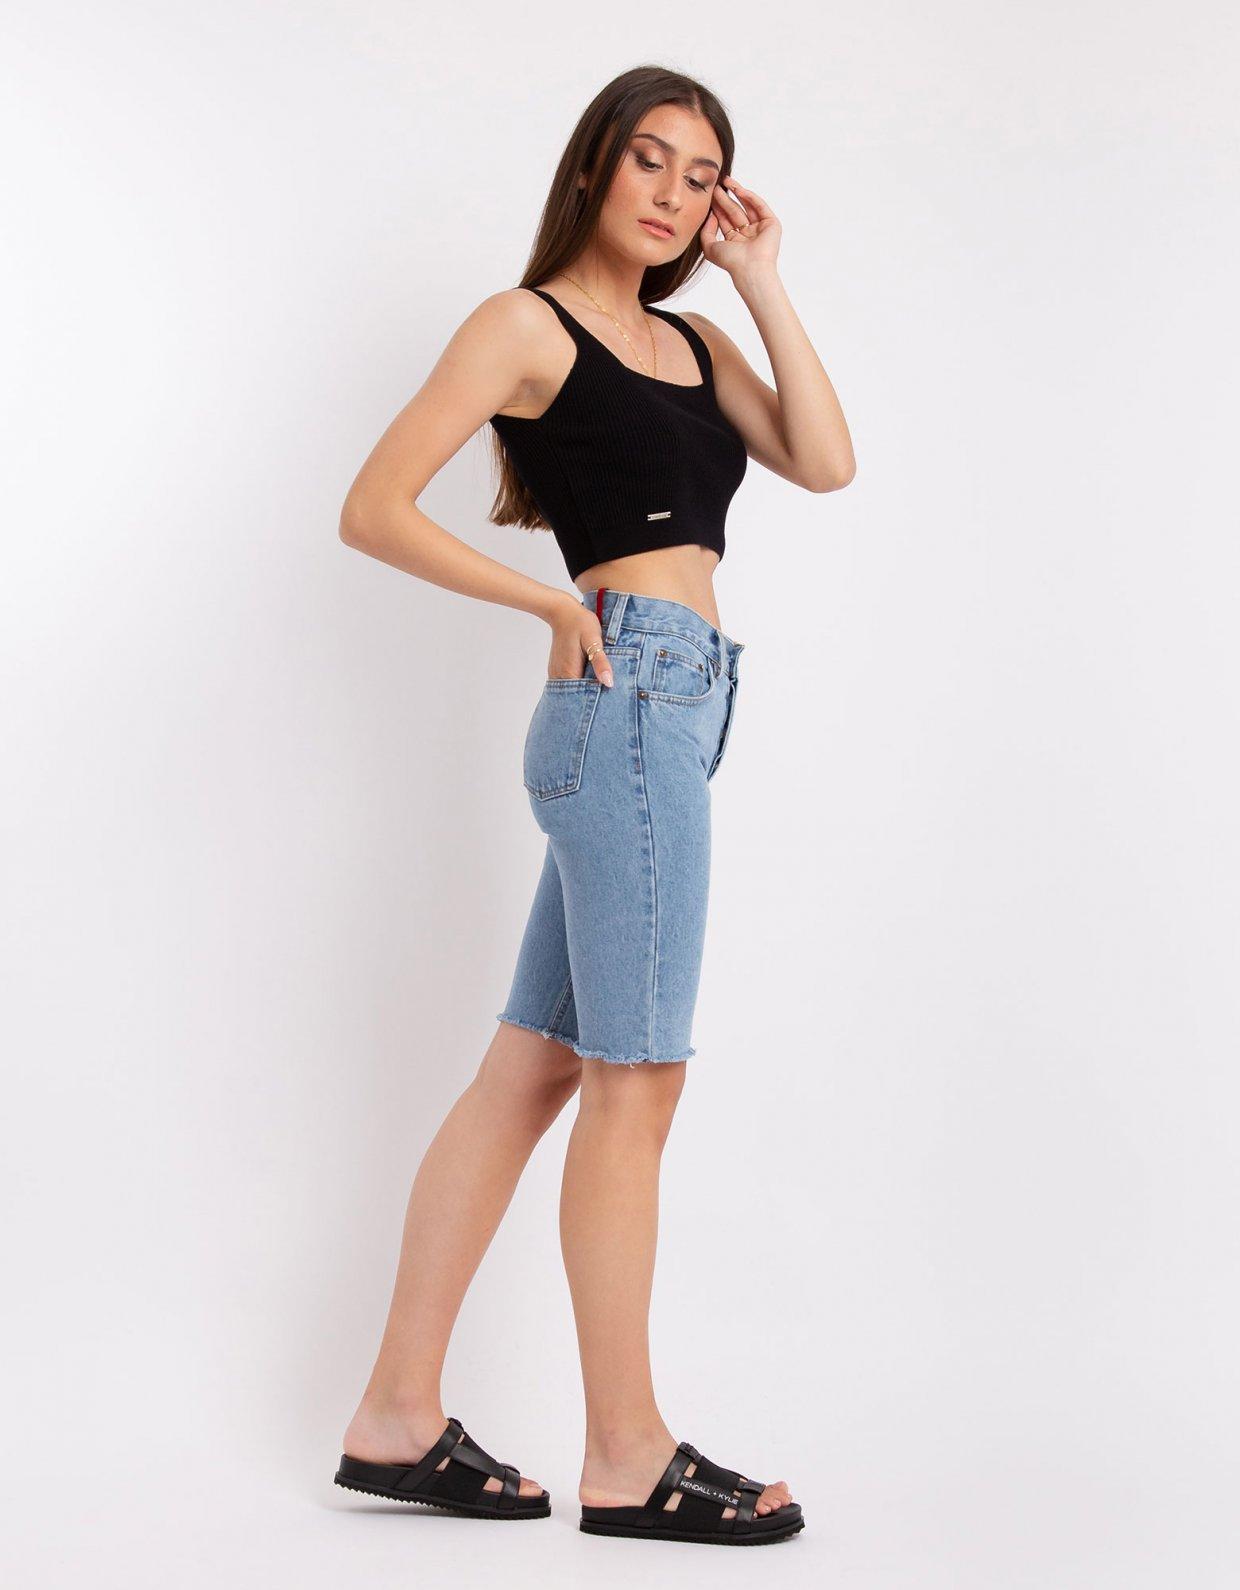 Combos Knitwear Combos S30 – Black top